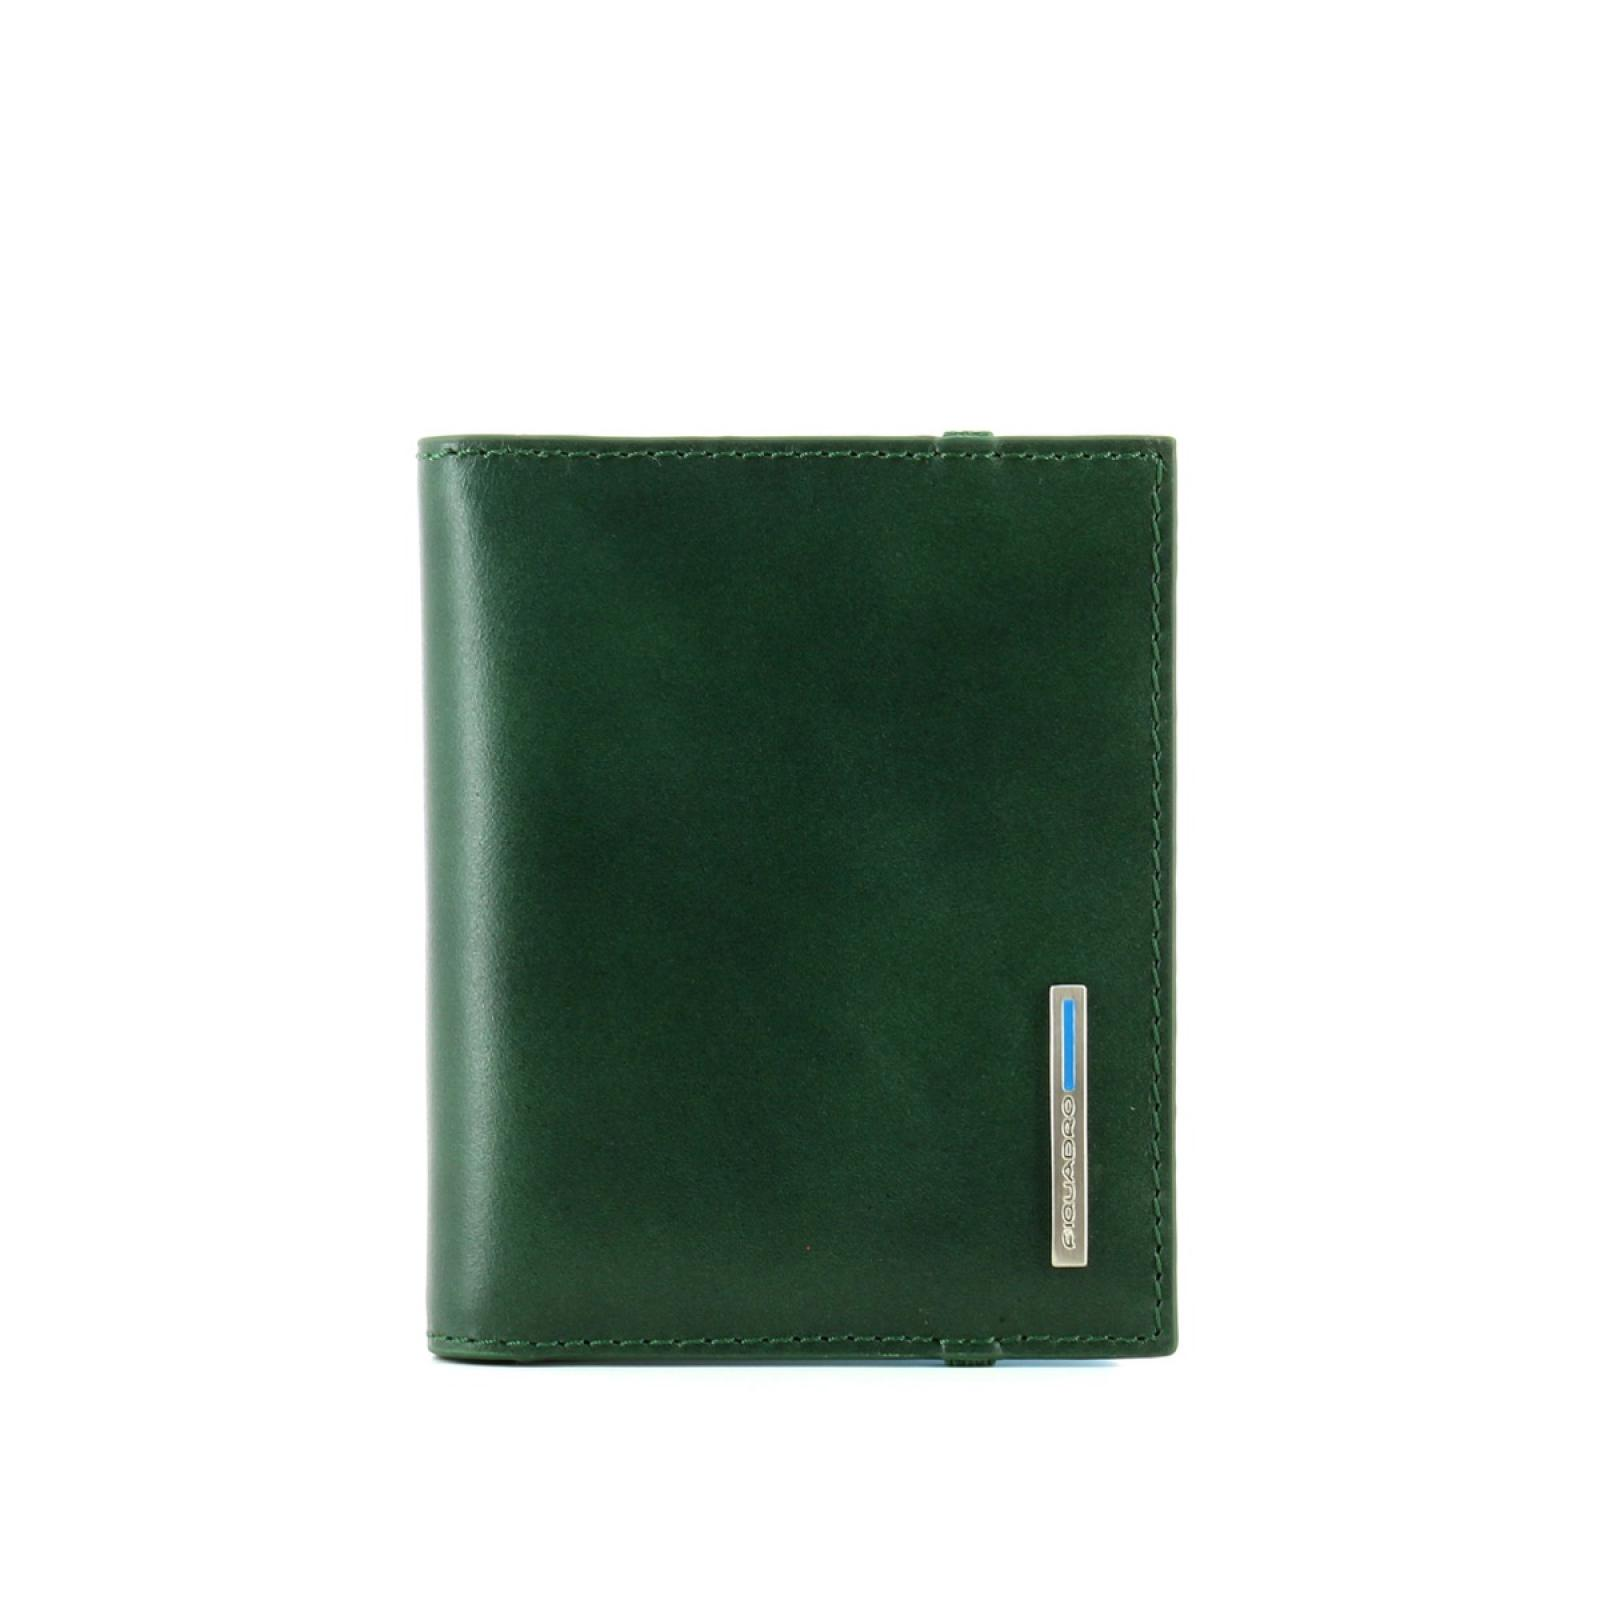 Card holder BLUE SQUARE 1395B2